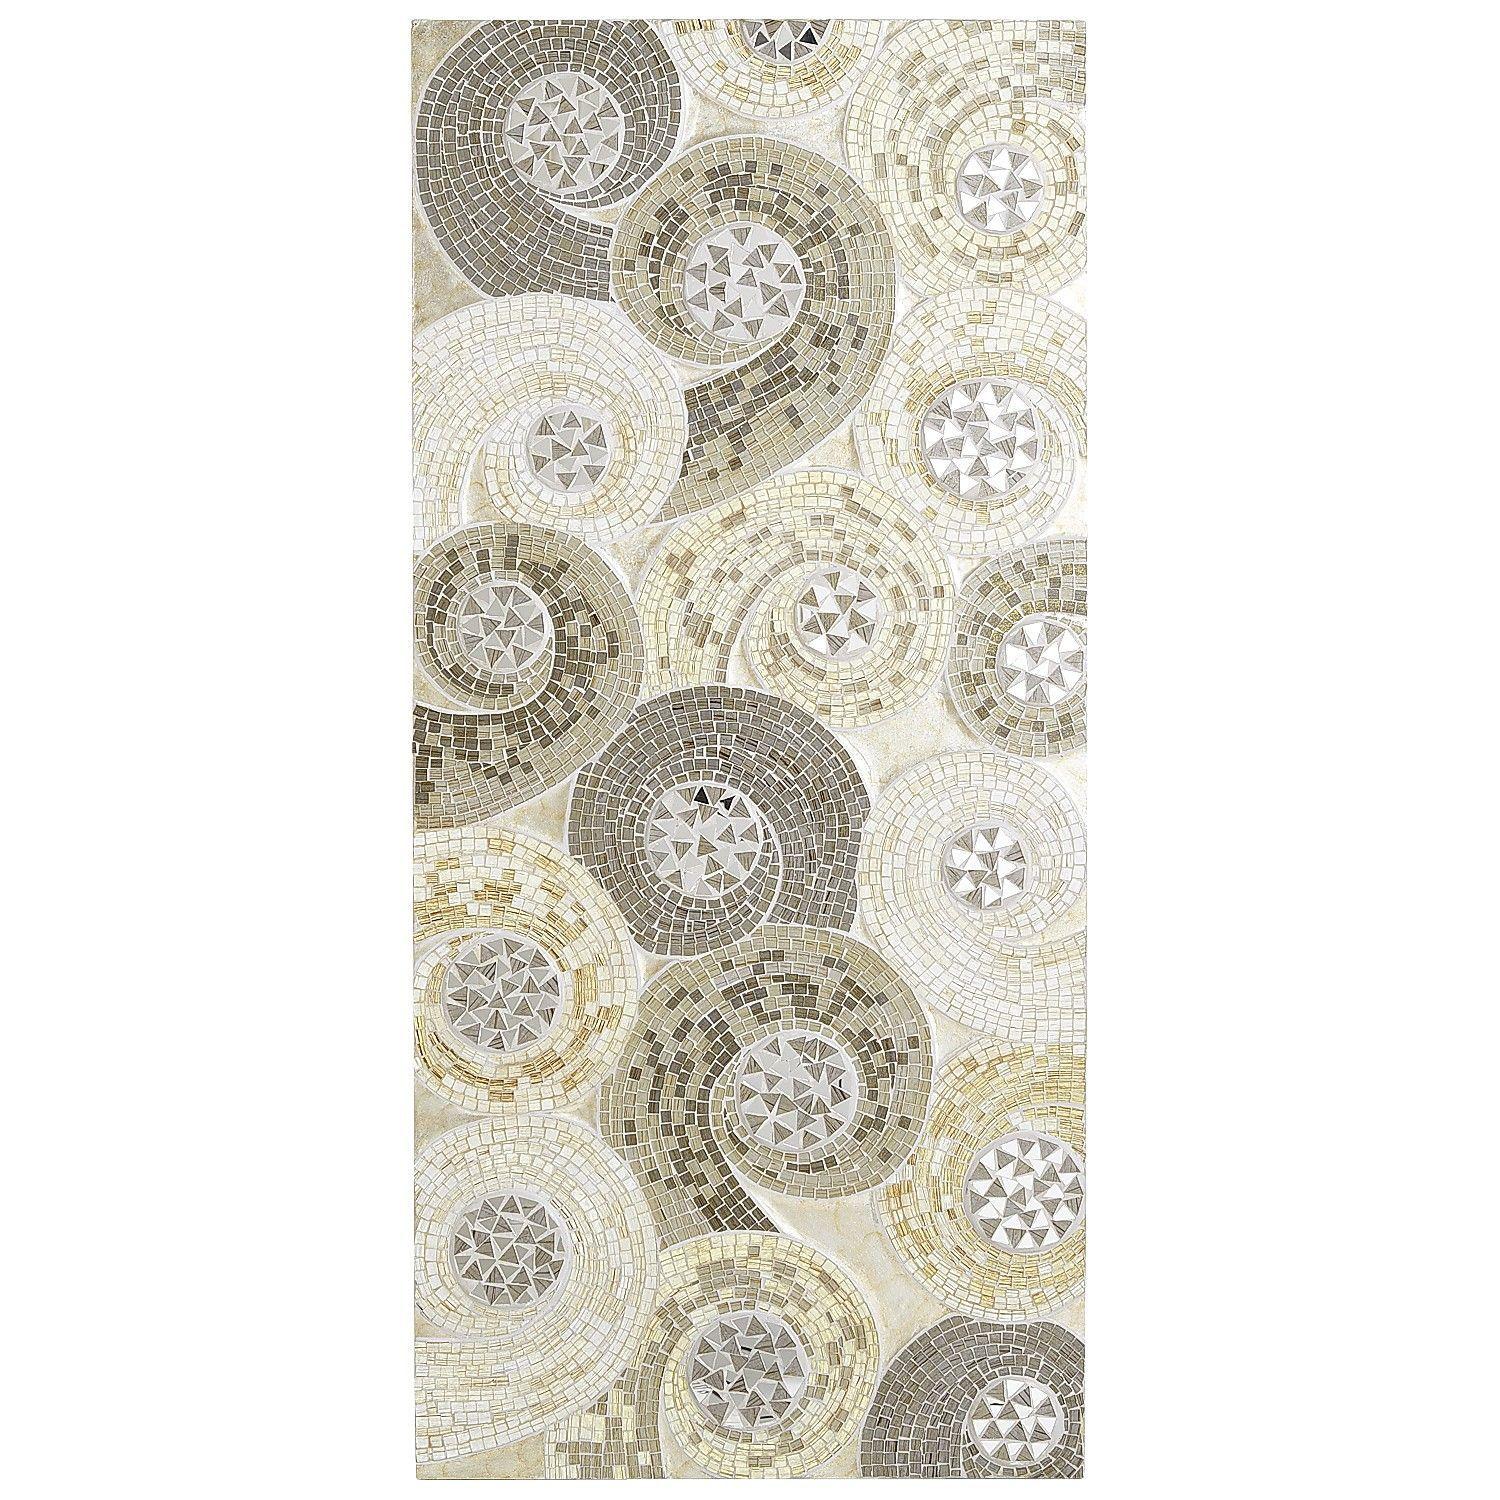 Mosaic Swirls Wall Panel - Silver - I think I need two of ...